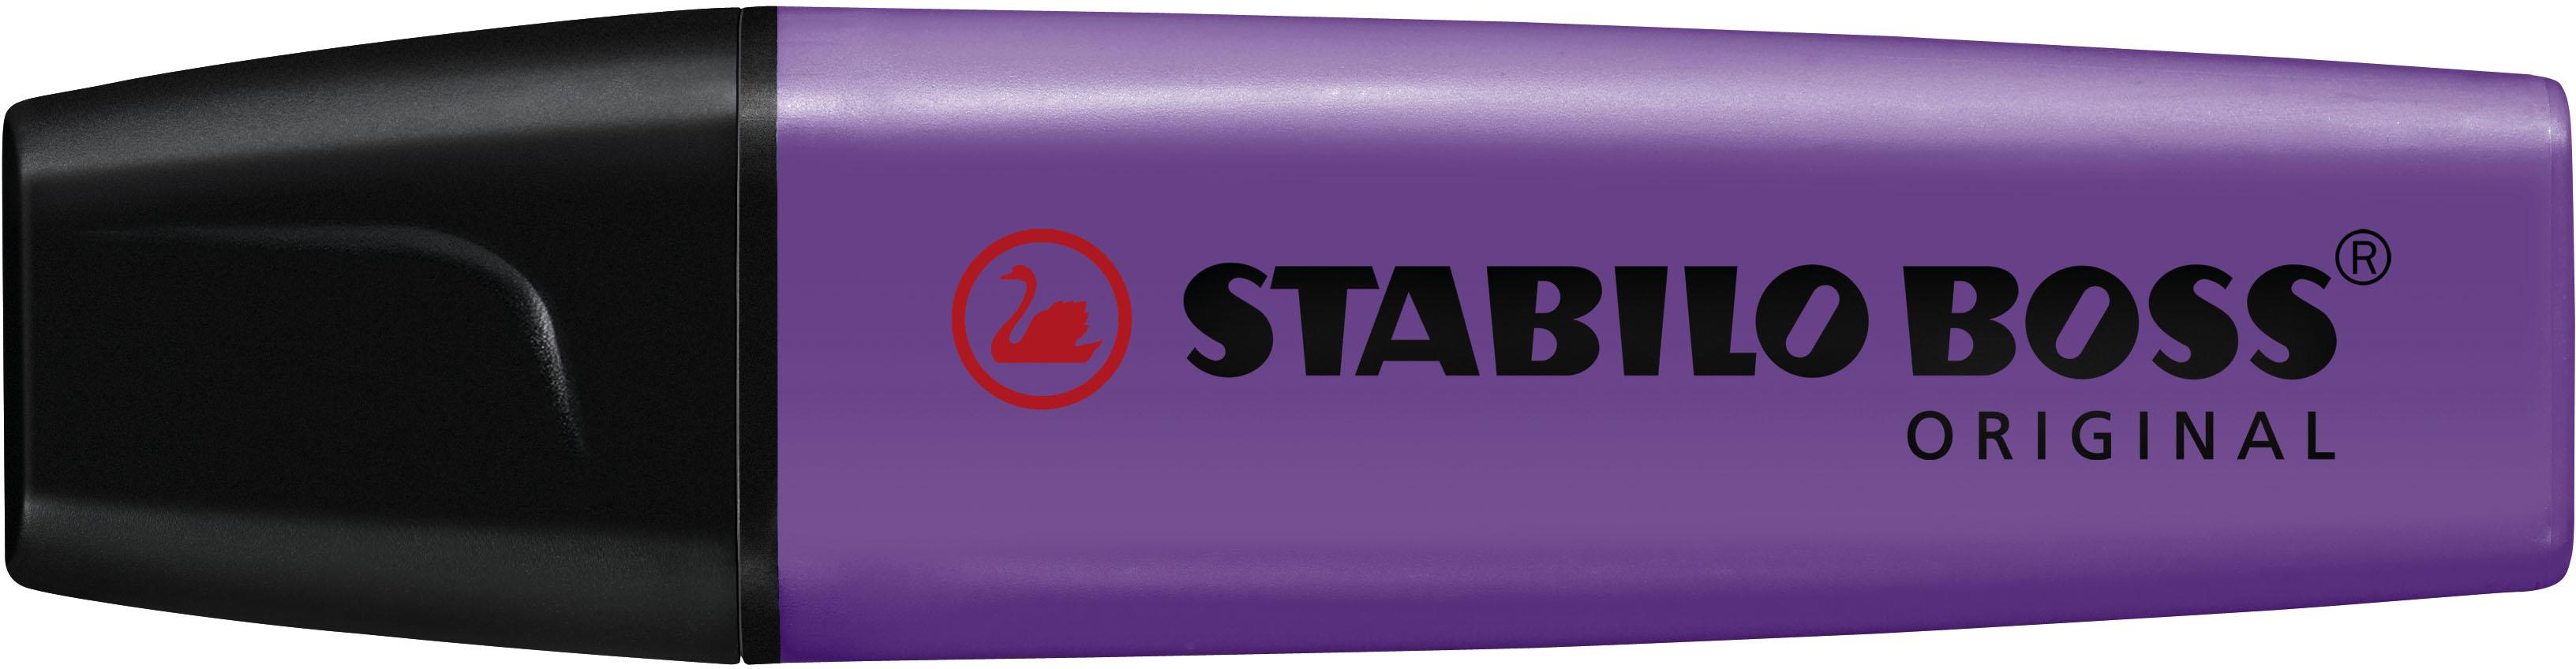 Stabilo Markeerstift BOSS 10-Pack paars